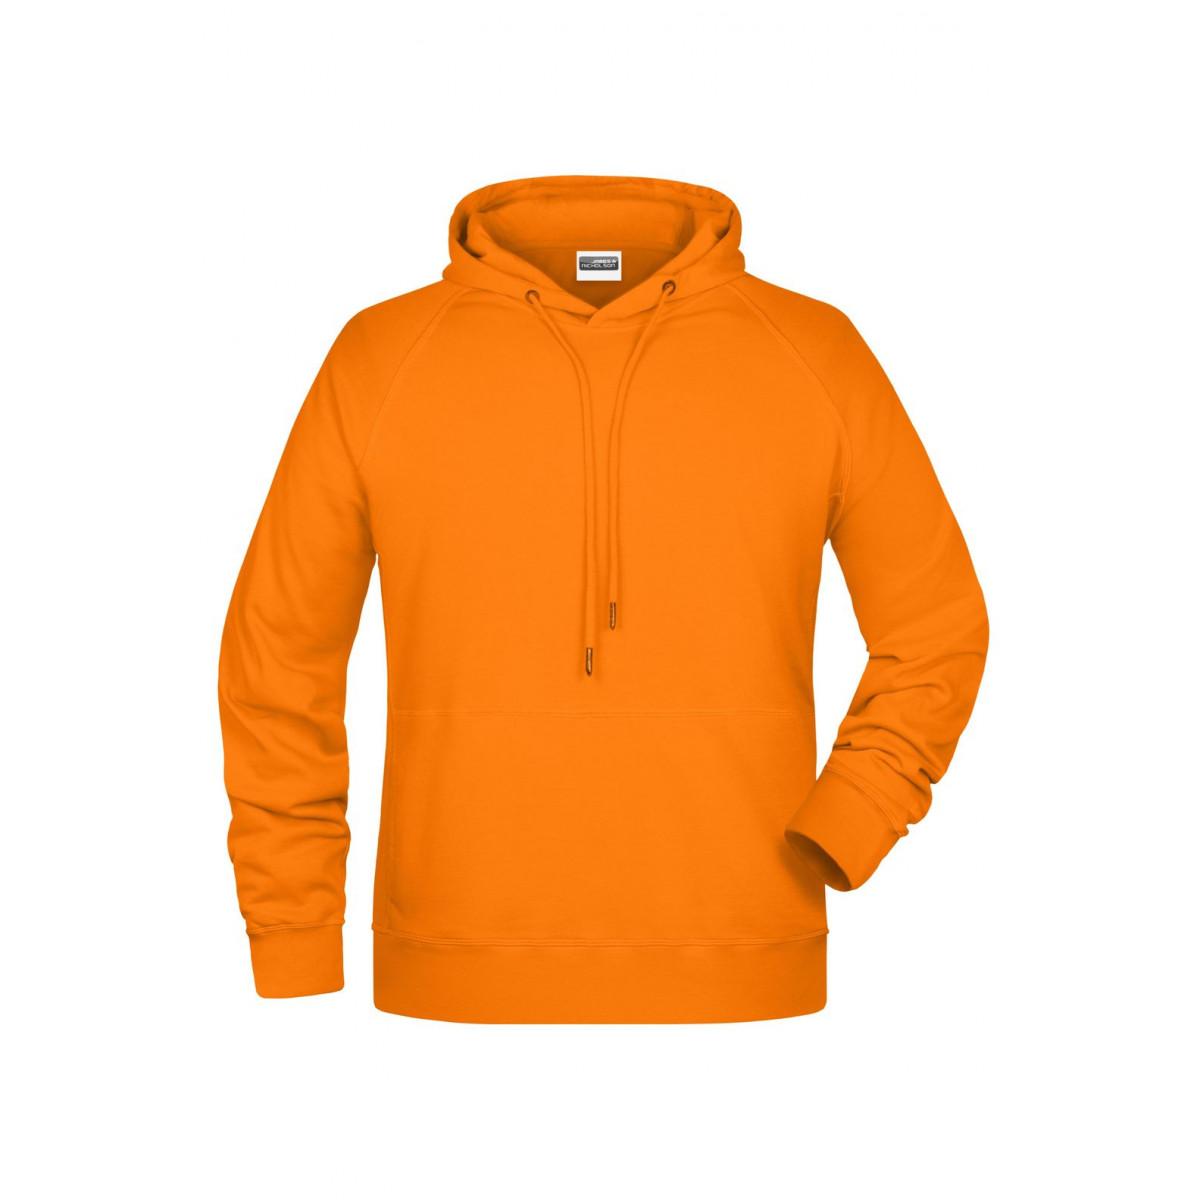 Толстовка мужская 8024 Mens Hoody - Оранжевый